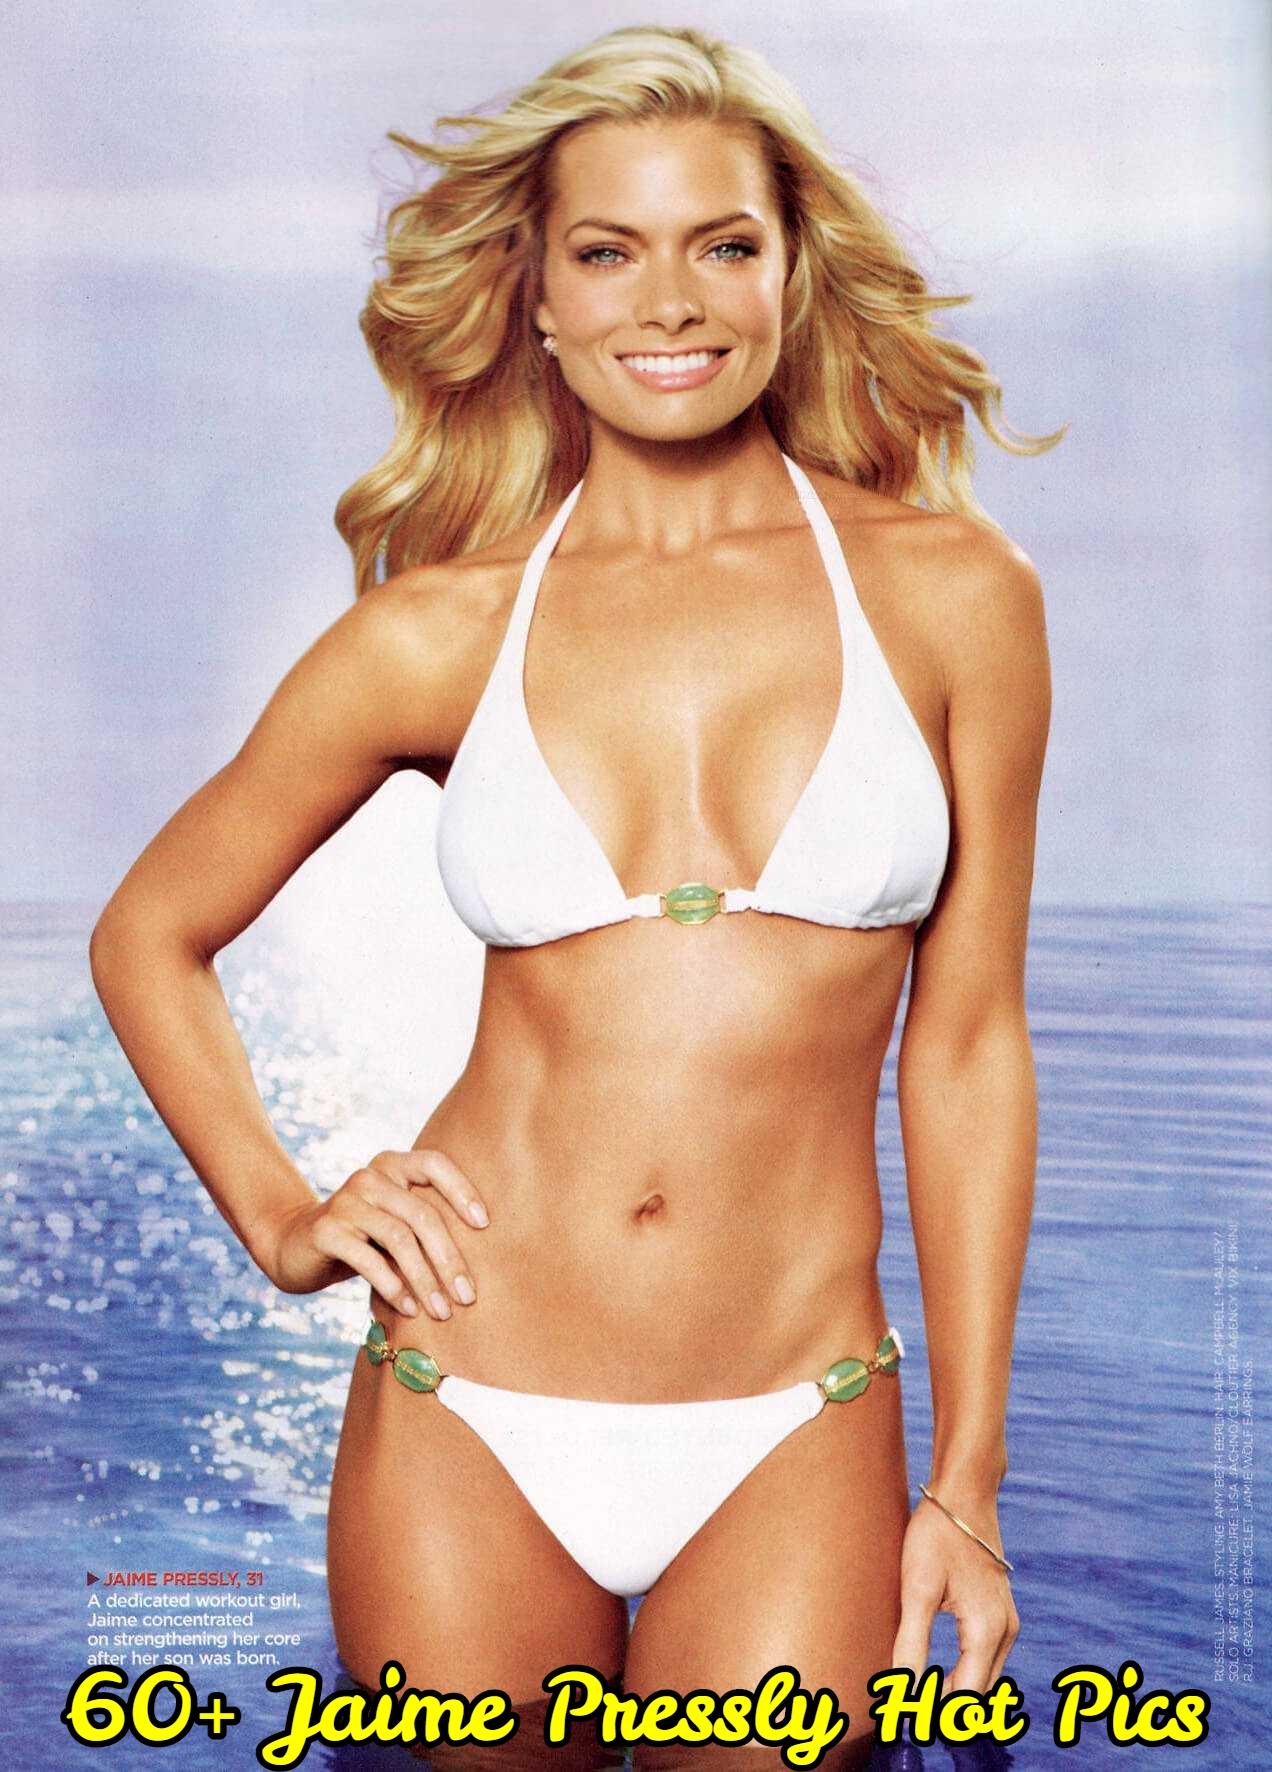 Jaime-Pressly-hot-bikini-photos